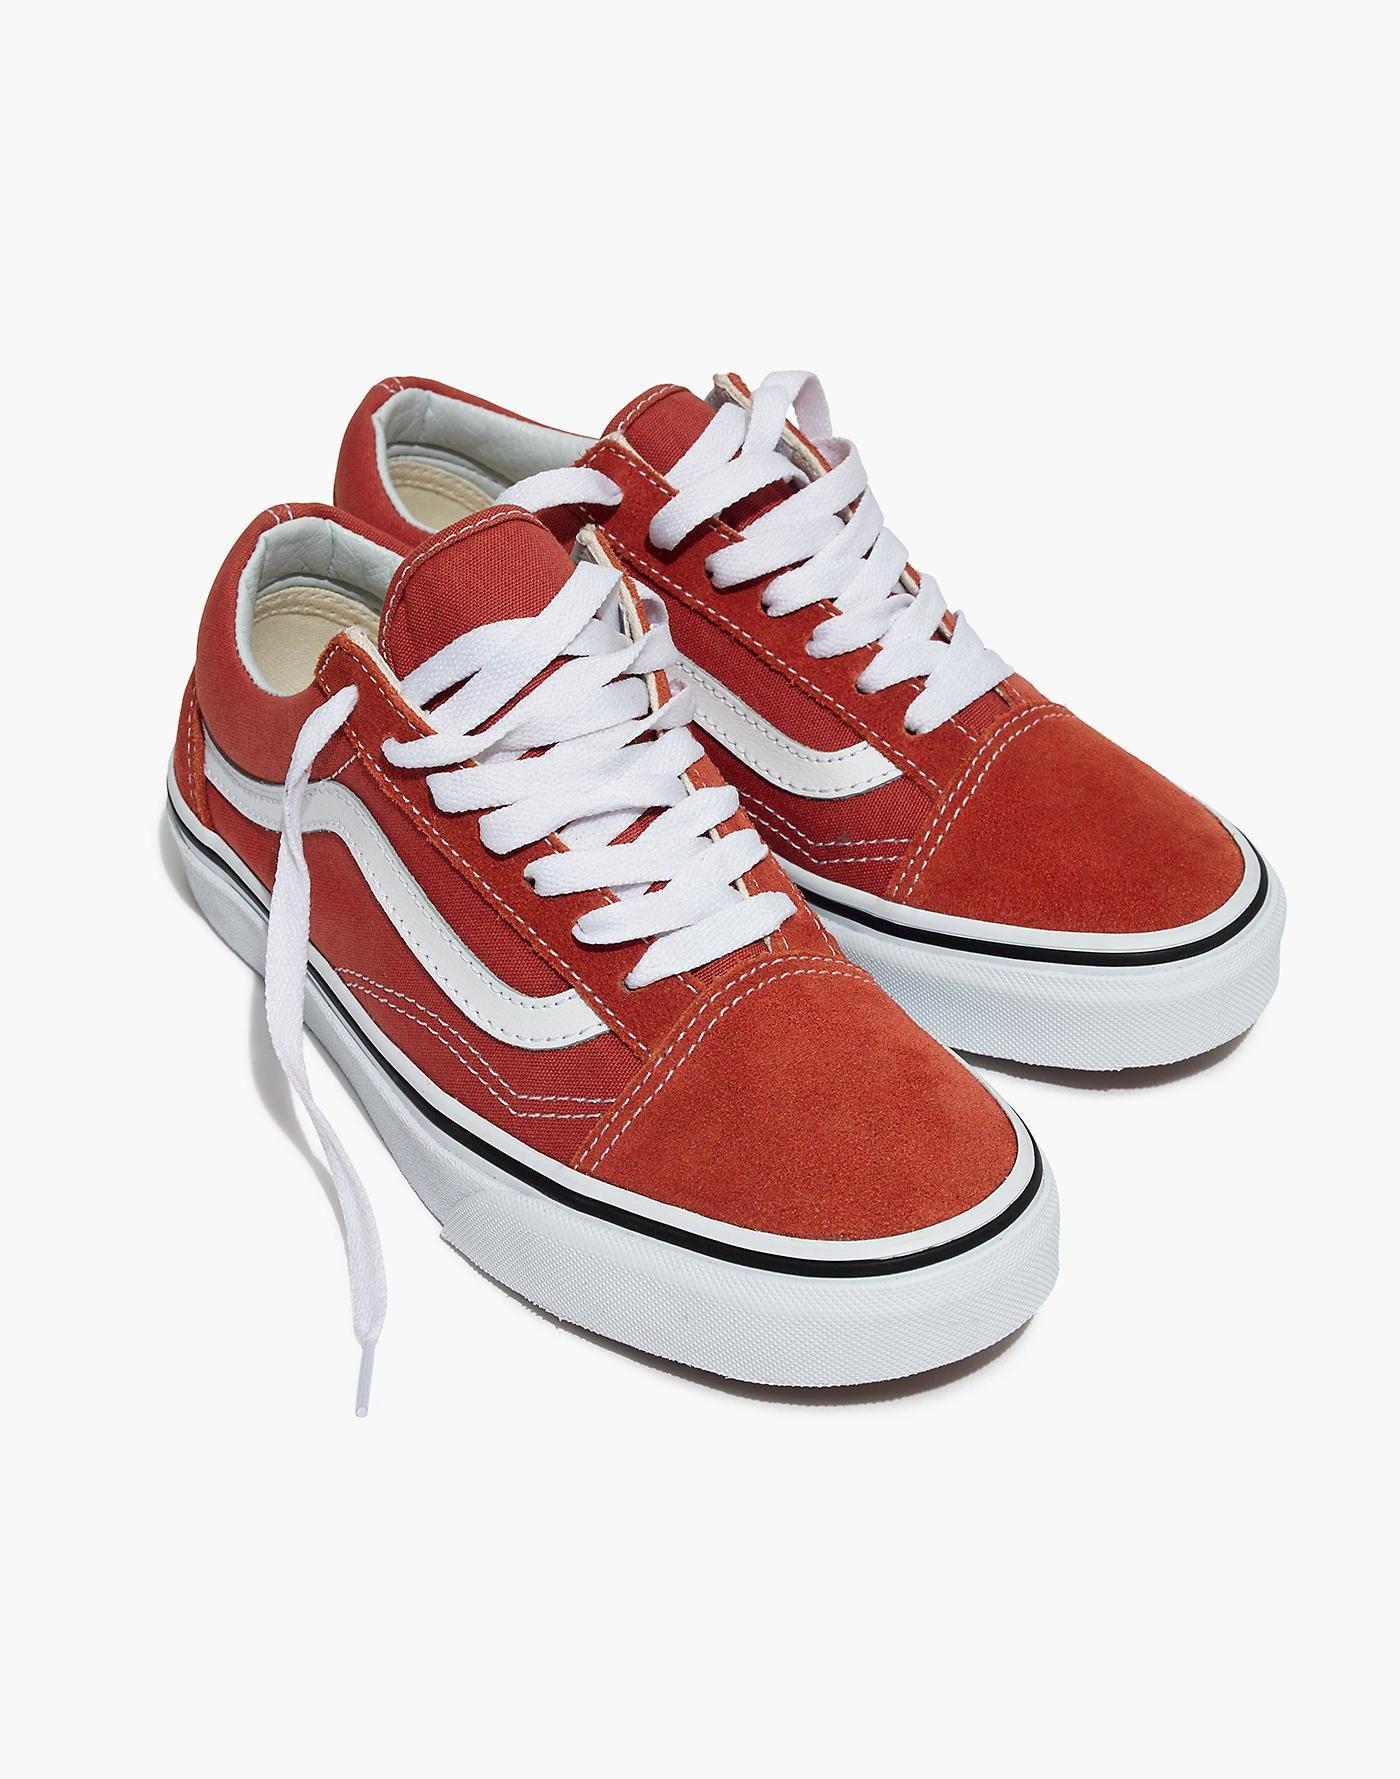 d5ae16ba41 Lyst - Madewell Vans Unisex Old Skool Lace-up Sneakers in Red